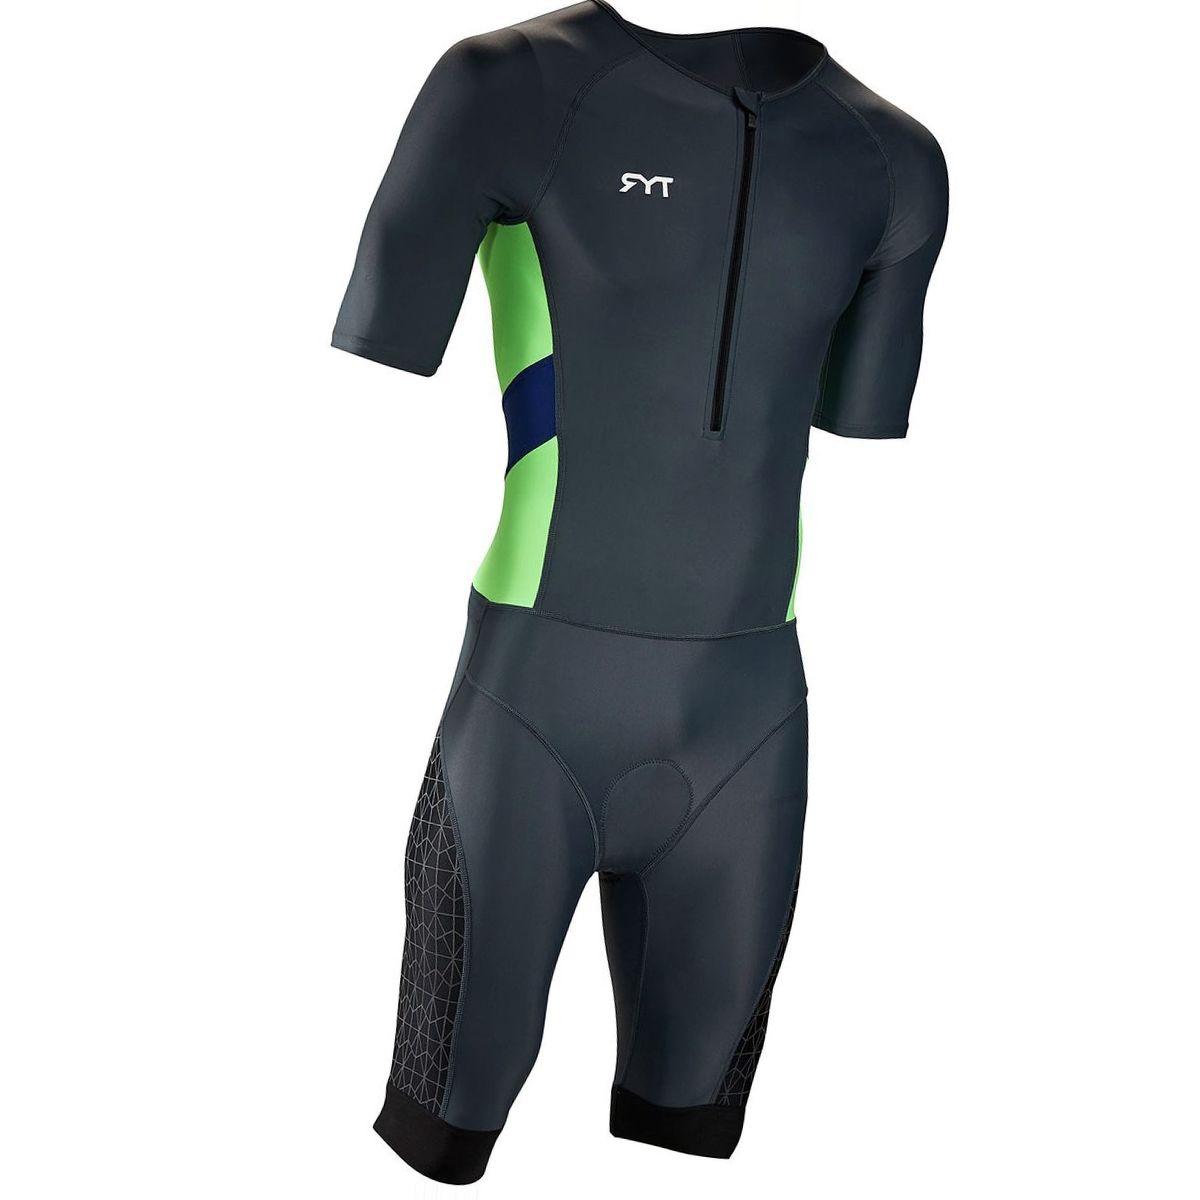 TYR Competitor Speedsuit - Men's